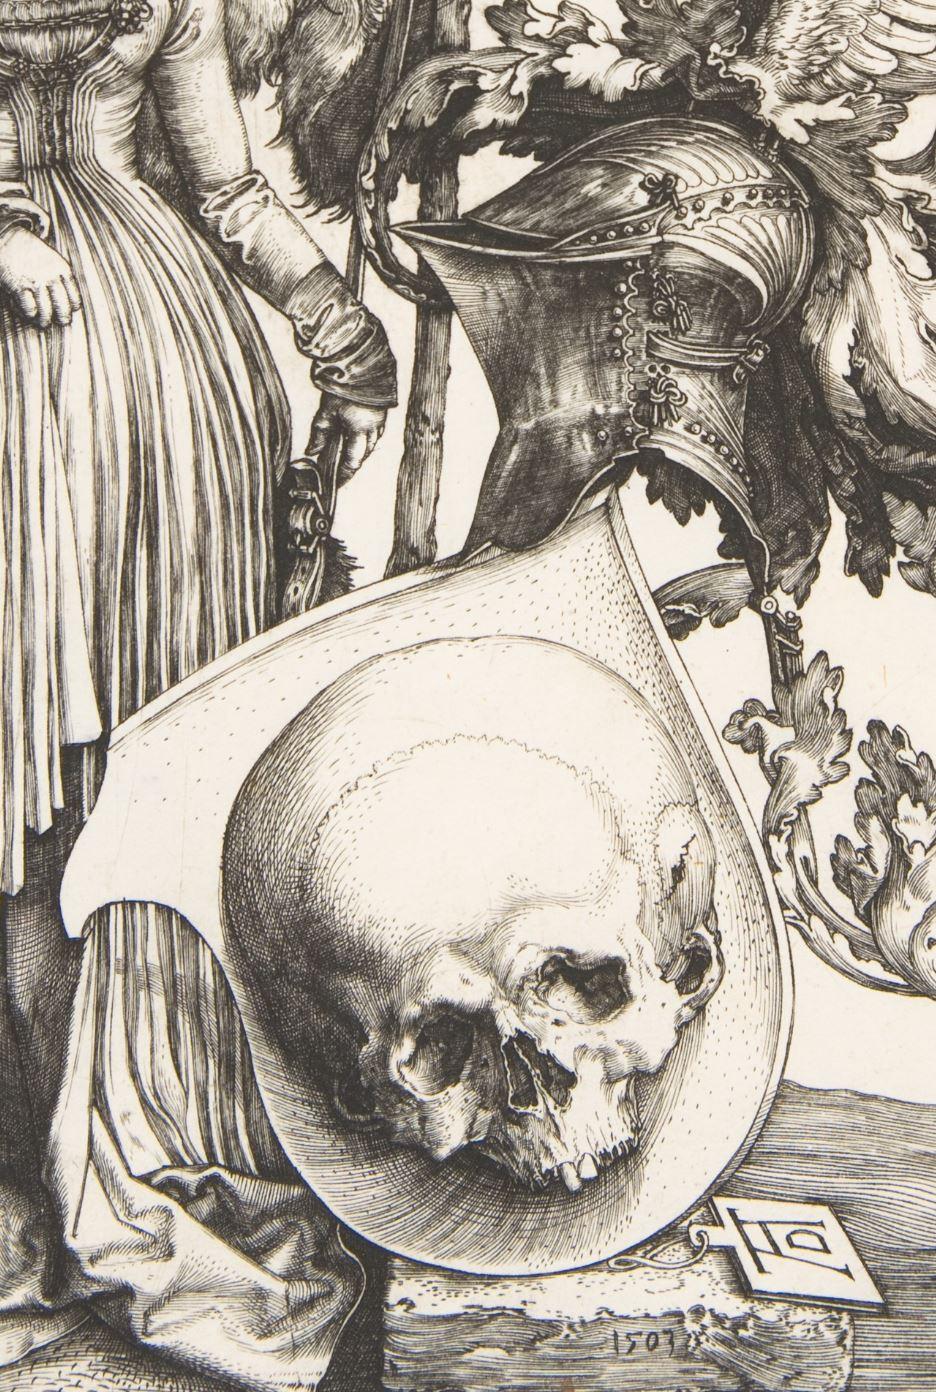 Durer 1503 Coat of Arms with a Skull MET detail ecu